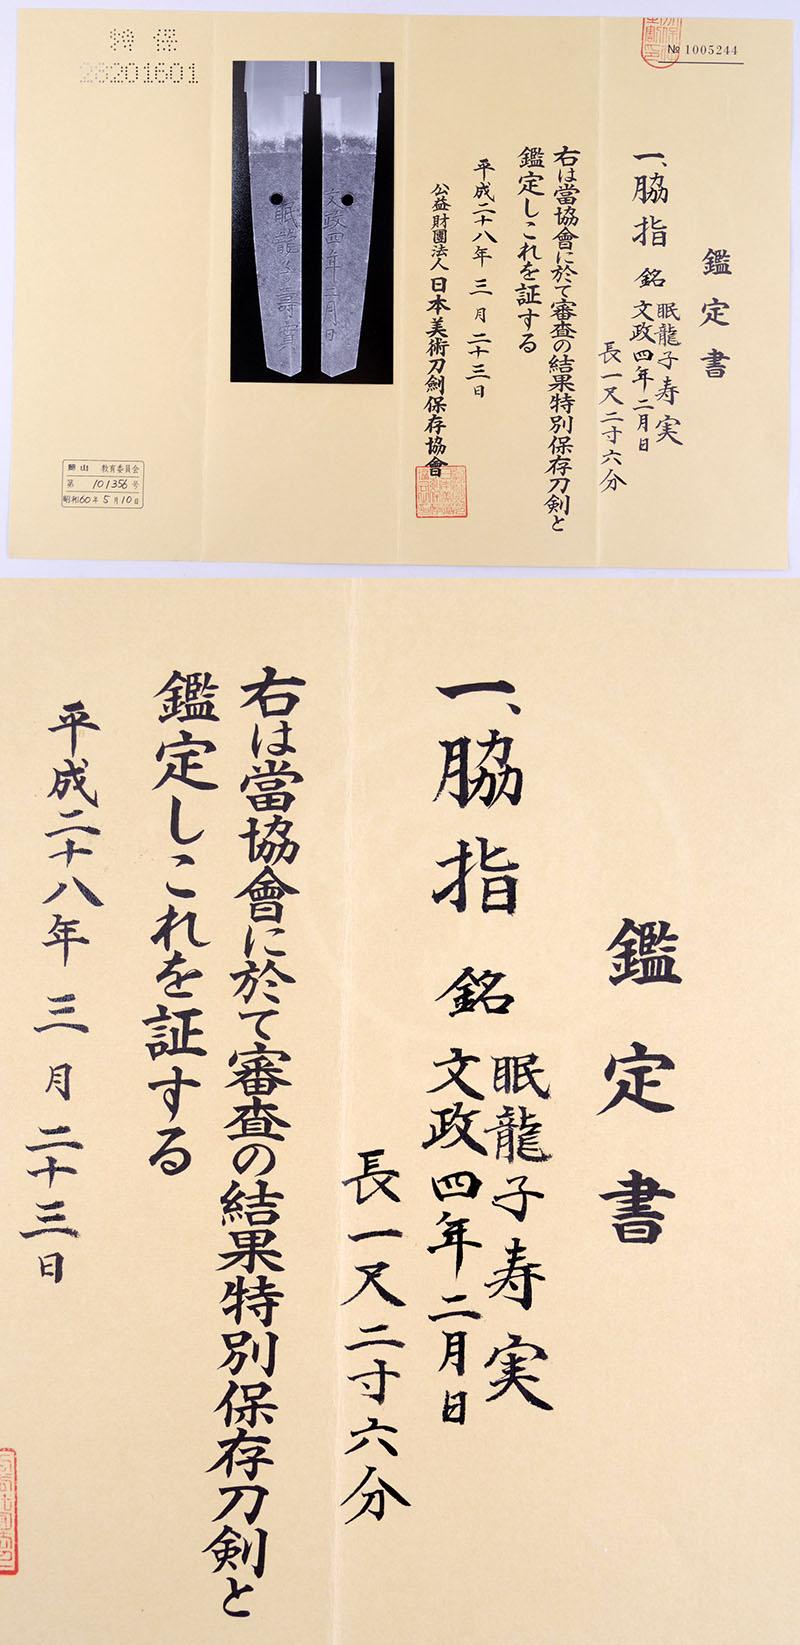 眠龍子寿実 Picture of Certificate